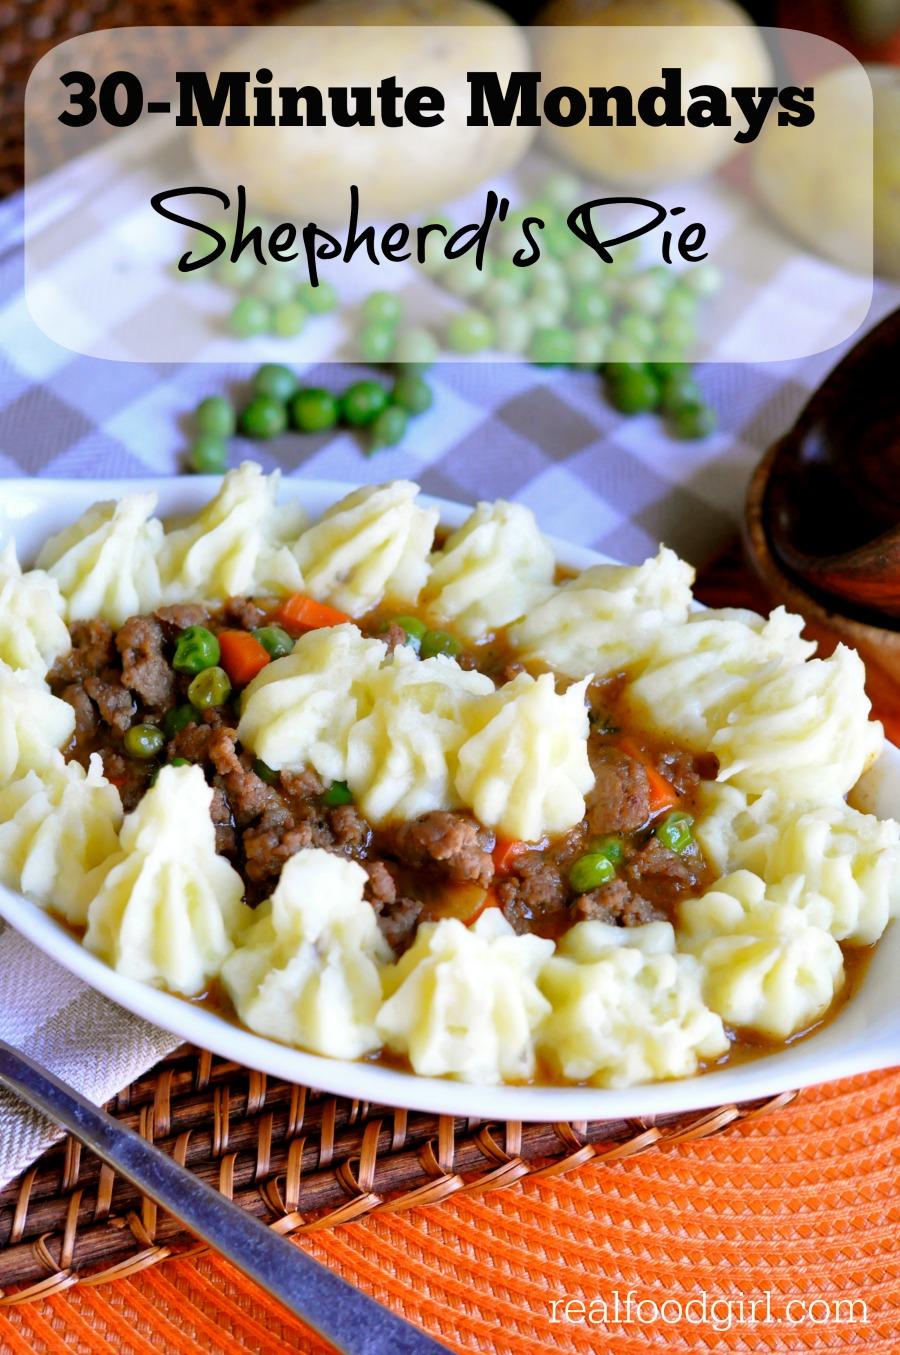 30-Minute Mondays by Real Food Girl: Unmodified- Shepherd's Pie. Savory ground lamb, fresh veggies, rich gravy-like sauce and fluffy mashed potatoes. Yum!